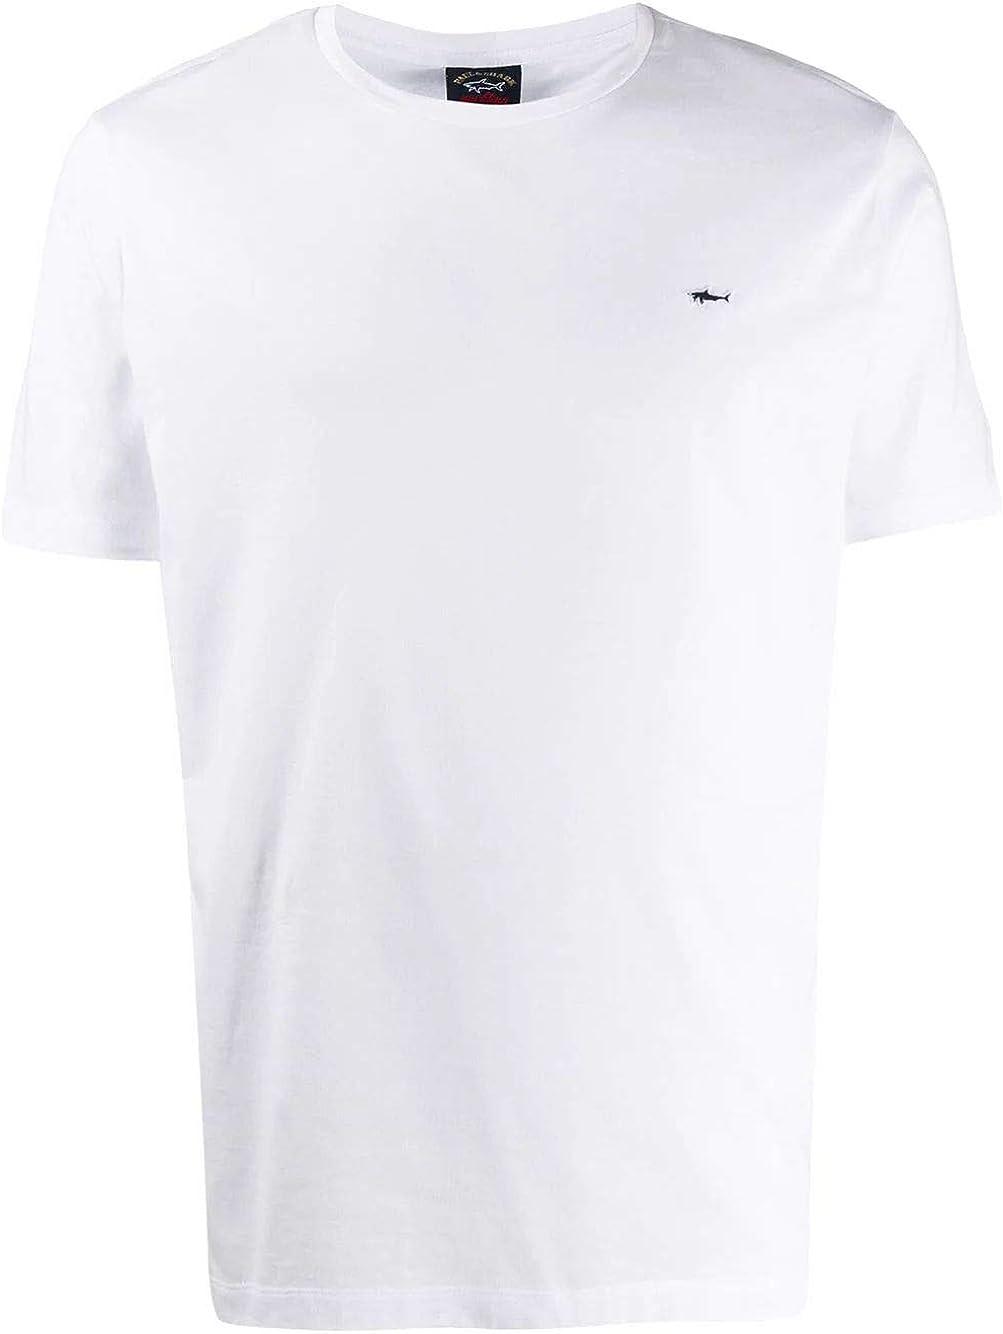 PAUL & SHARK Luxury Fashion Man E20P1074010 White Cotton T-Shirt   Spring Summer 20